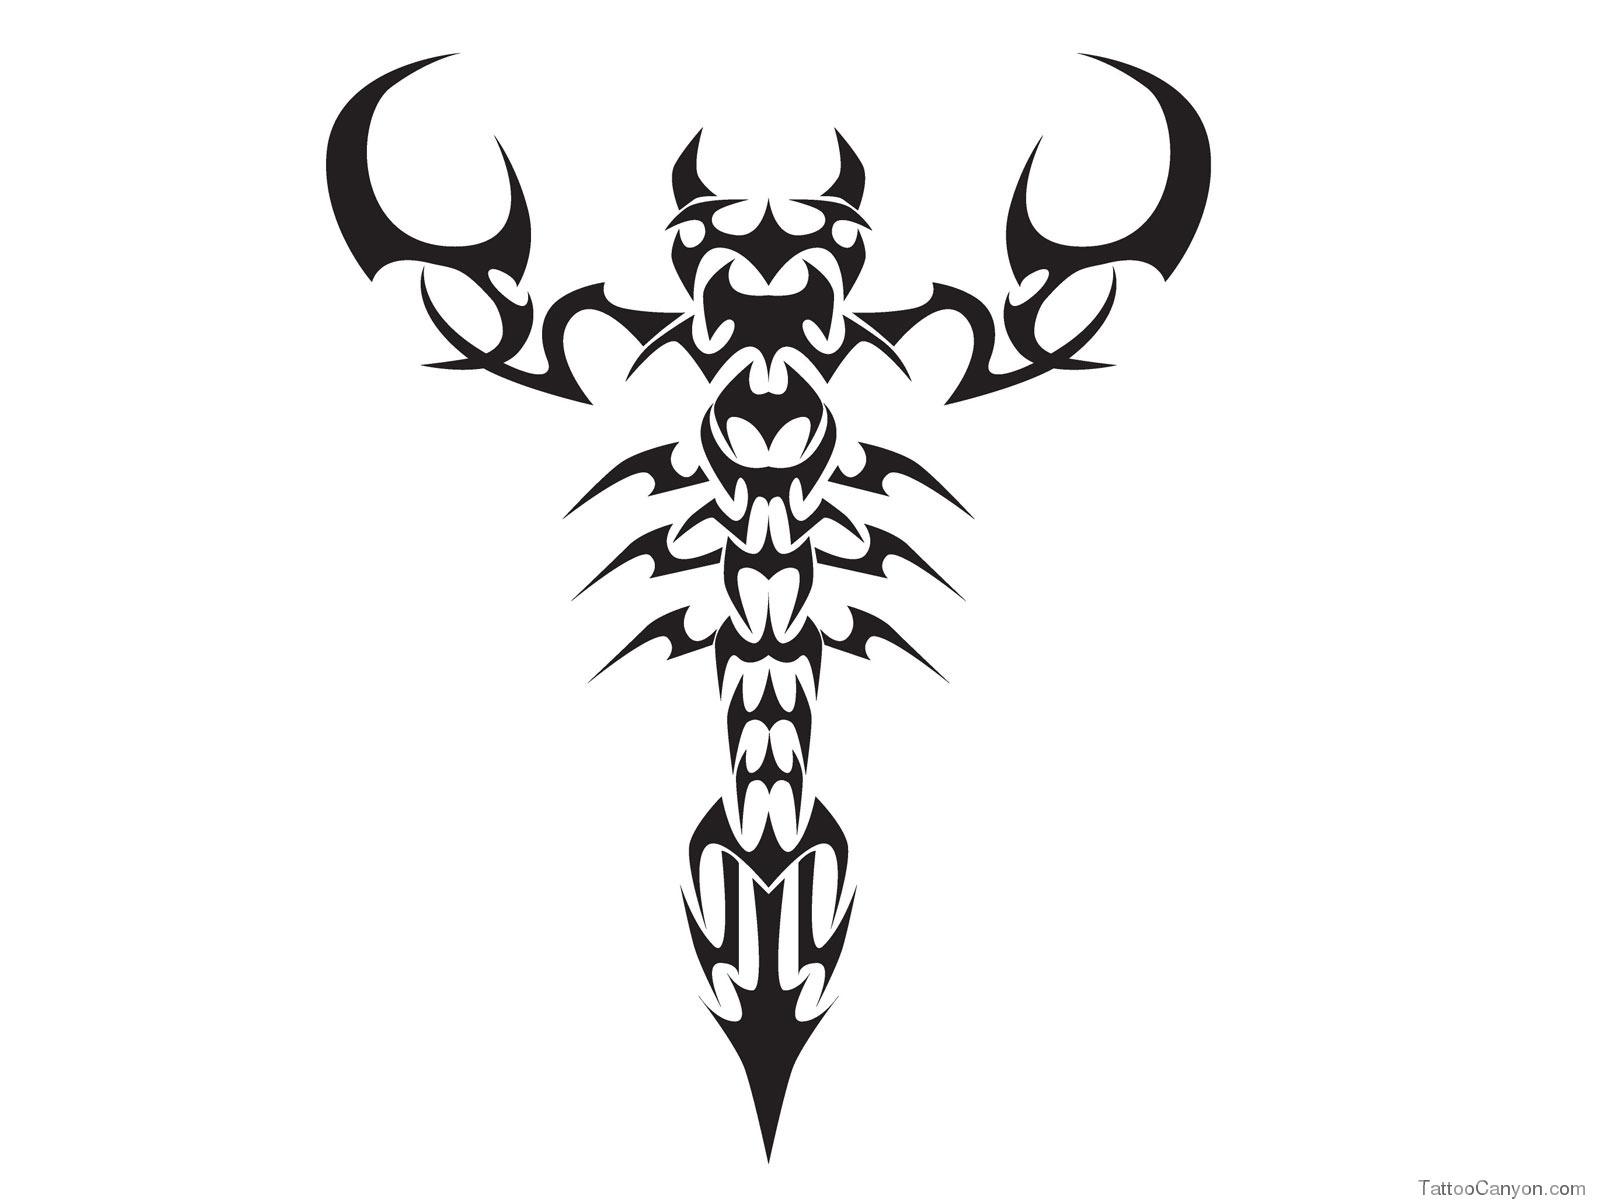 Download Designs Tribal Scorpion Tattoo Wallpaper Picture 382 1600x1200